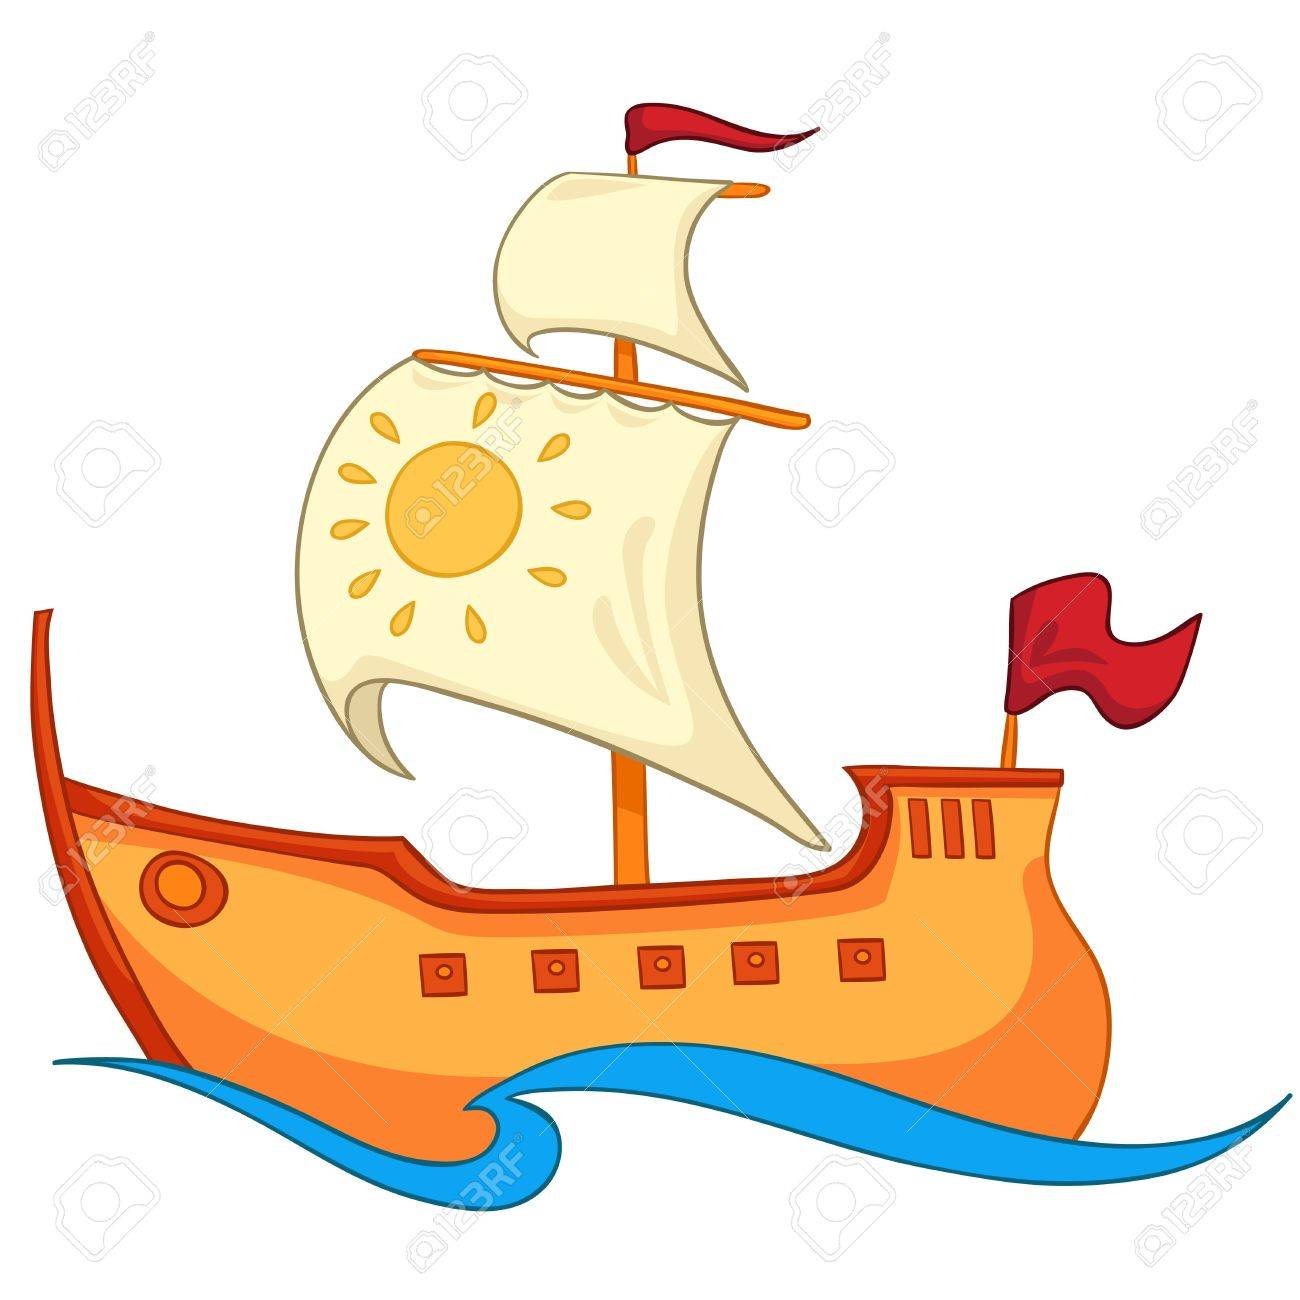 Cartoon Ship Royalty Free Cliparts Vectors And Stock Illustration Image 12137191